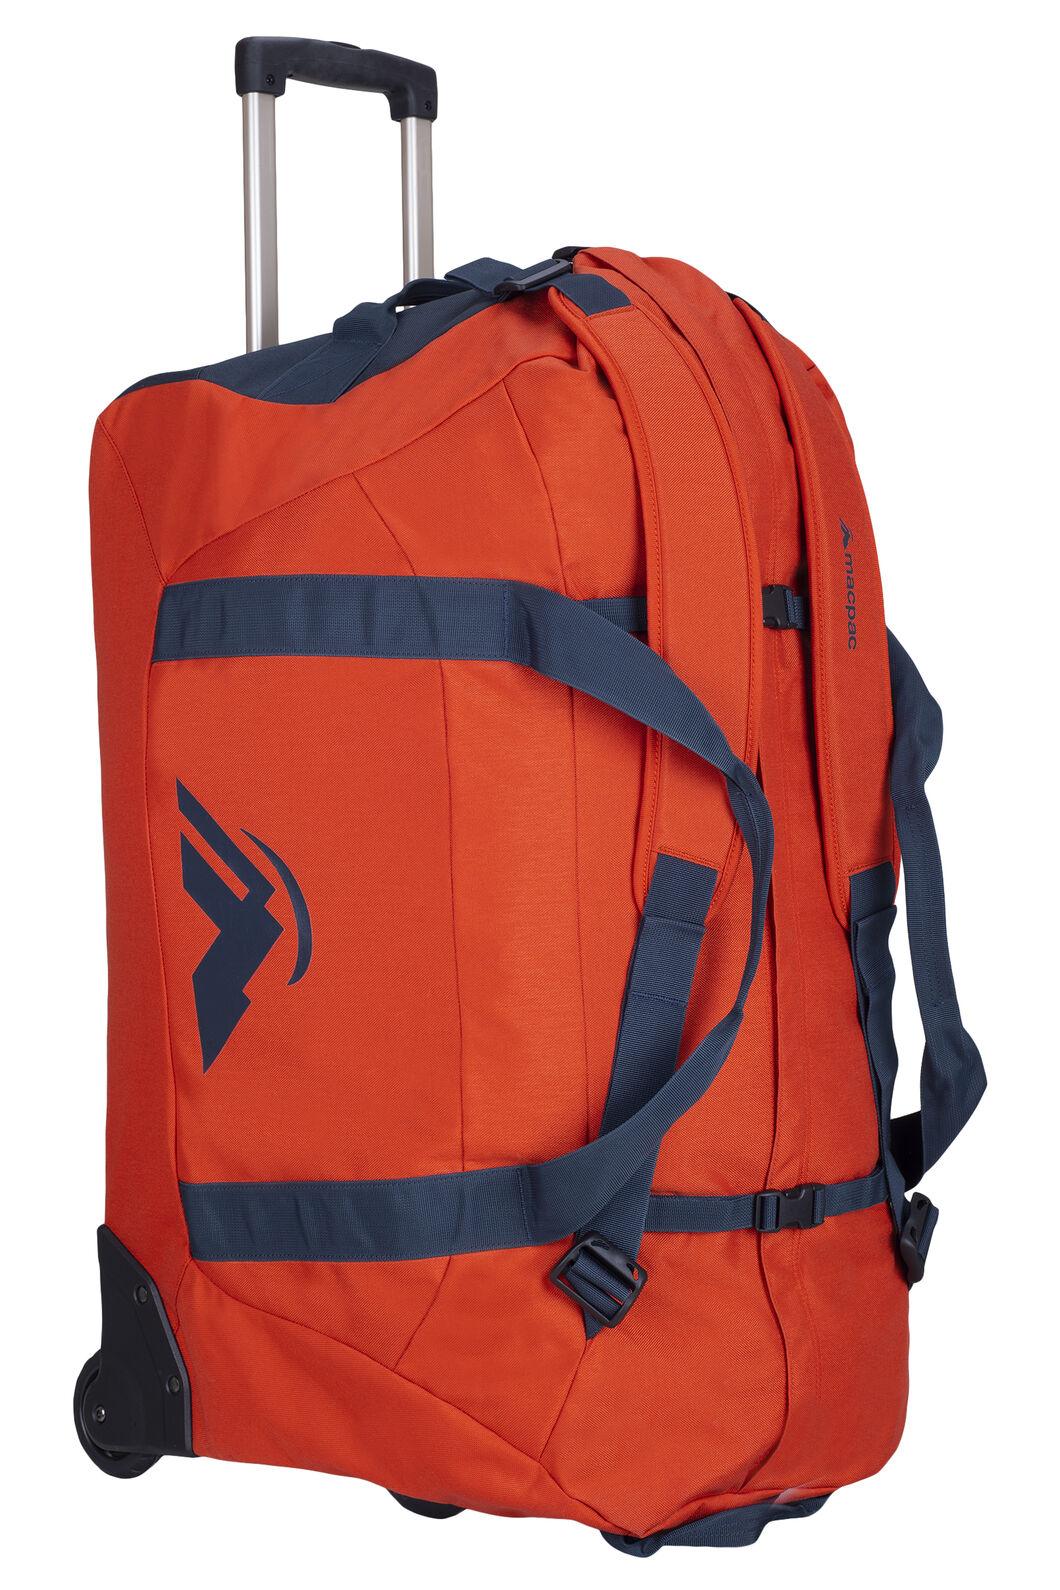 Macpac 120L Wheeled Duffel Bag, Pumpkin, hi-res